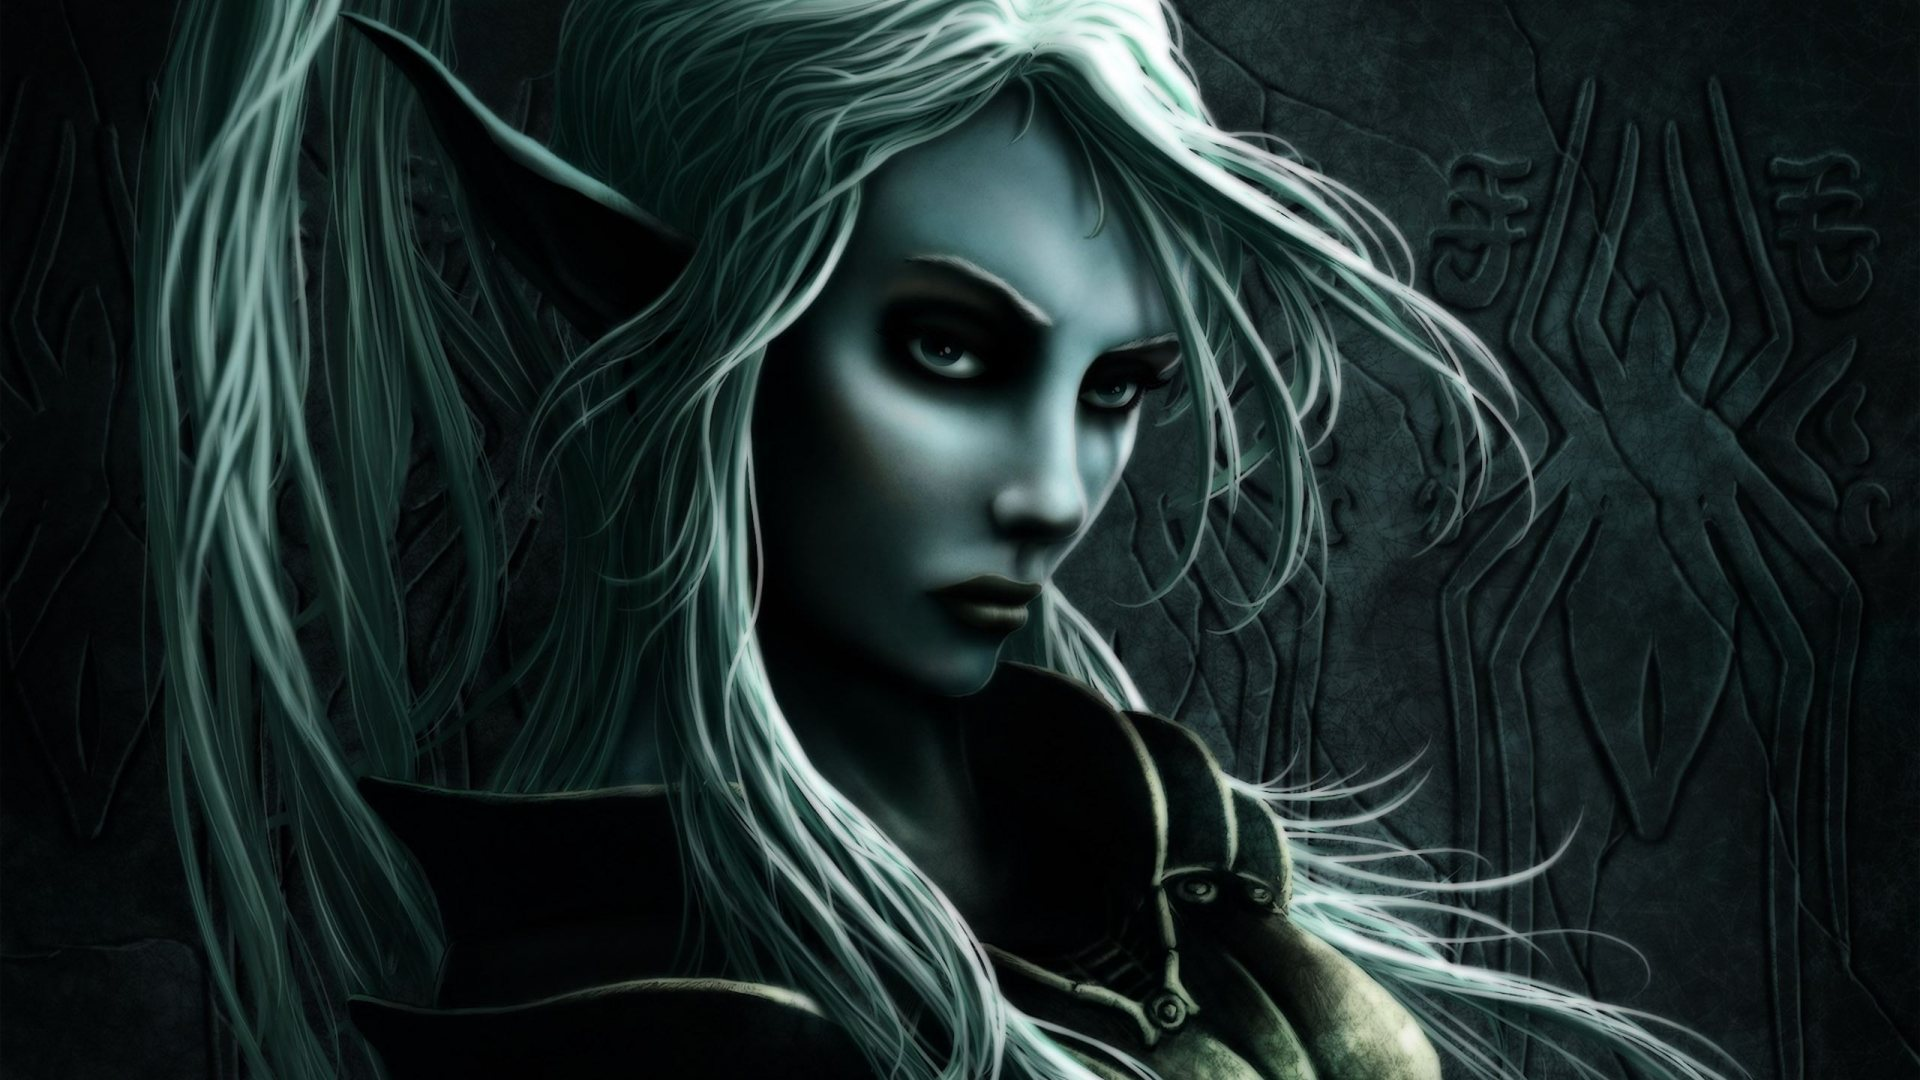 Dark Elf Full HD Desktop Wallpapers 1080p 1920x1080